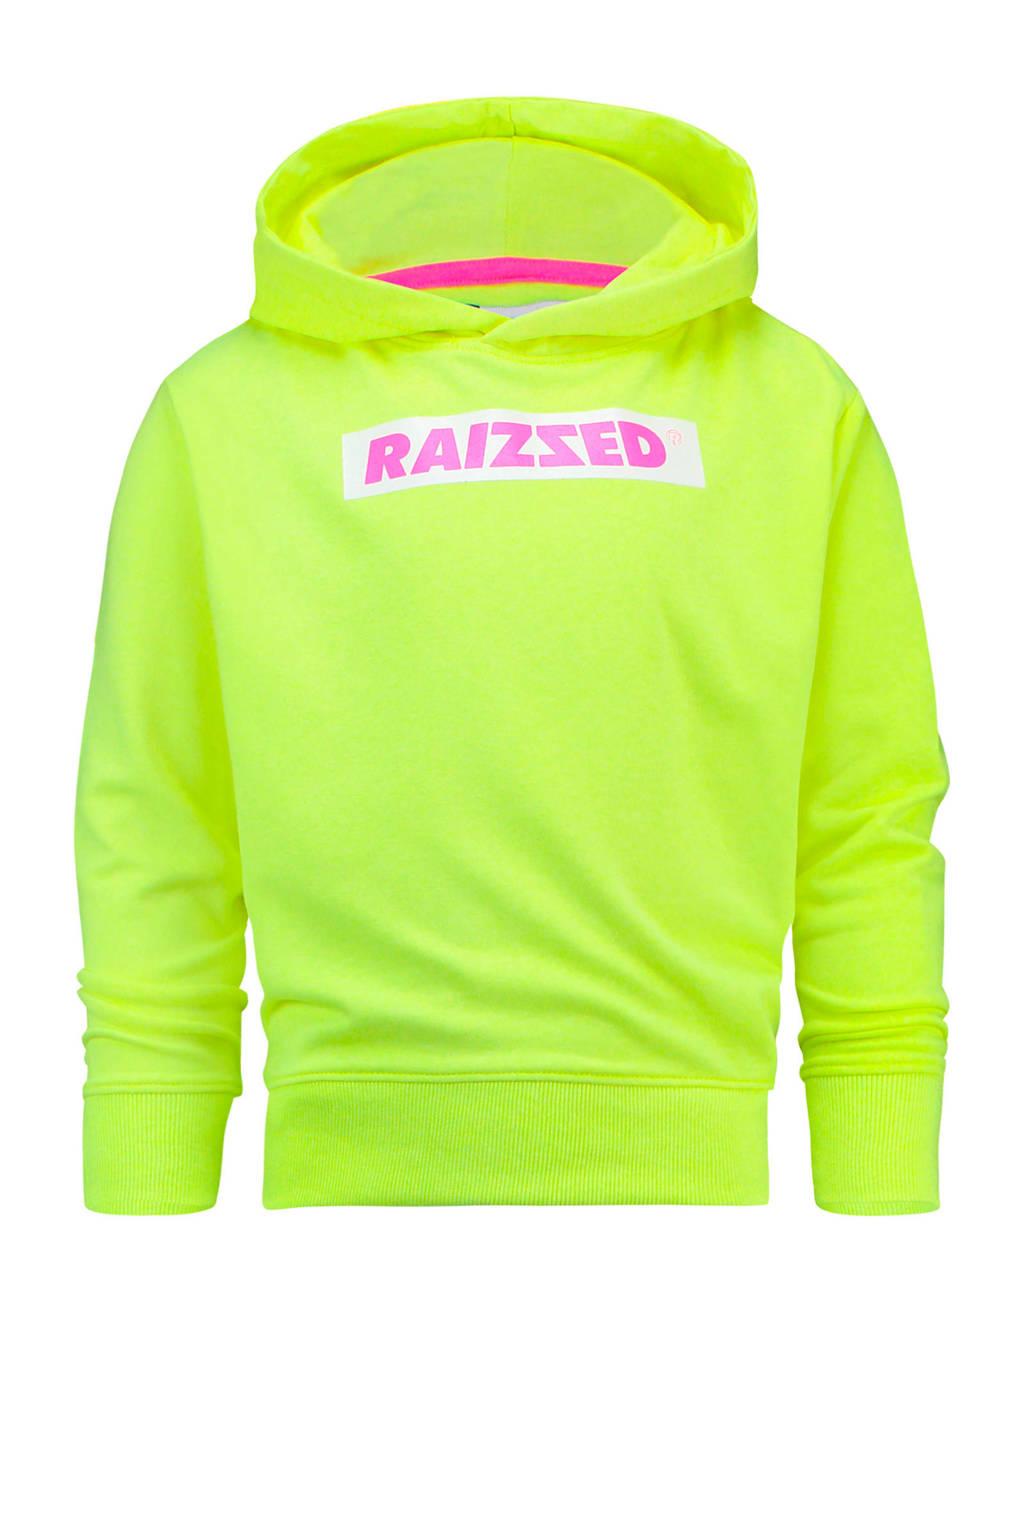 Raizzed hoodie Liverpool met logo neon limegroen, Neon Limegroen